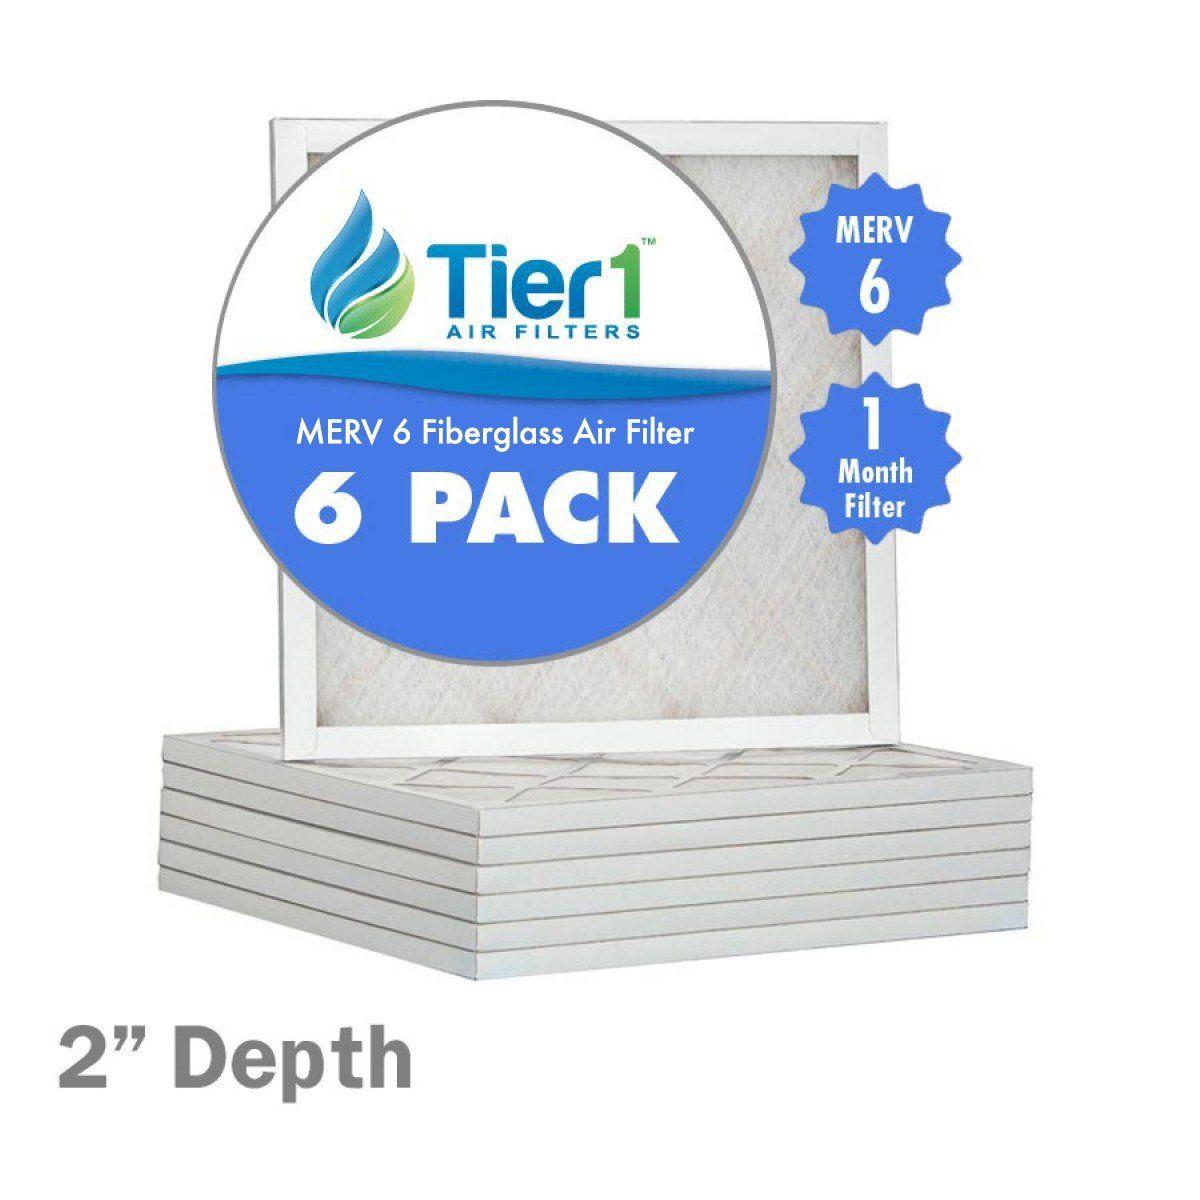 30x30x2 basic merv 6 air filterfurnace filter replacement